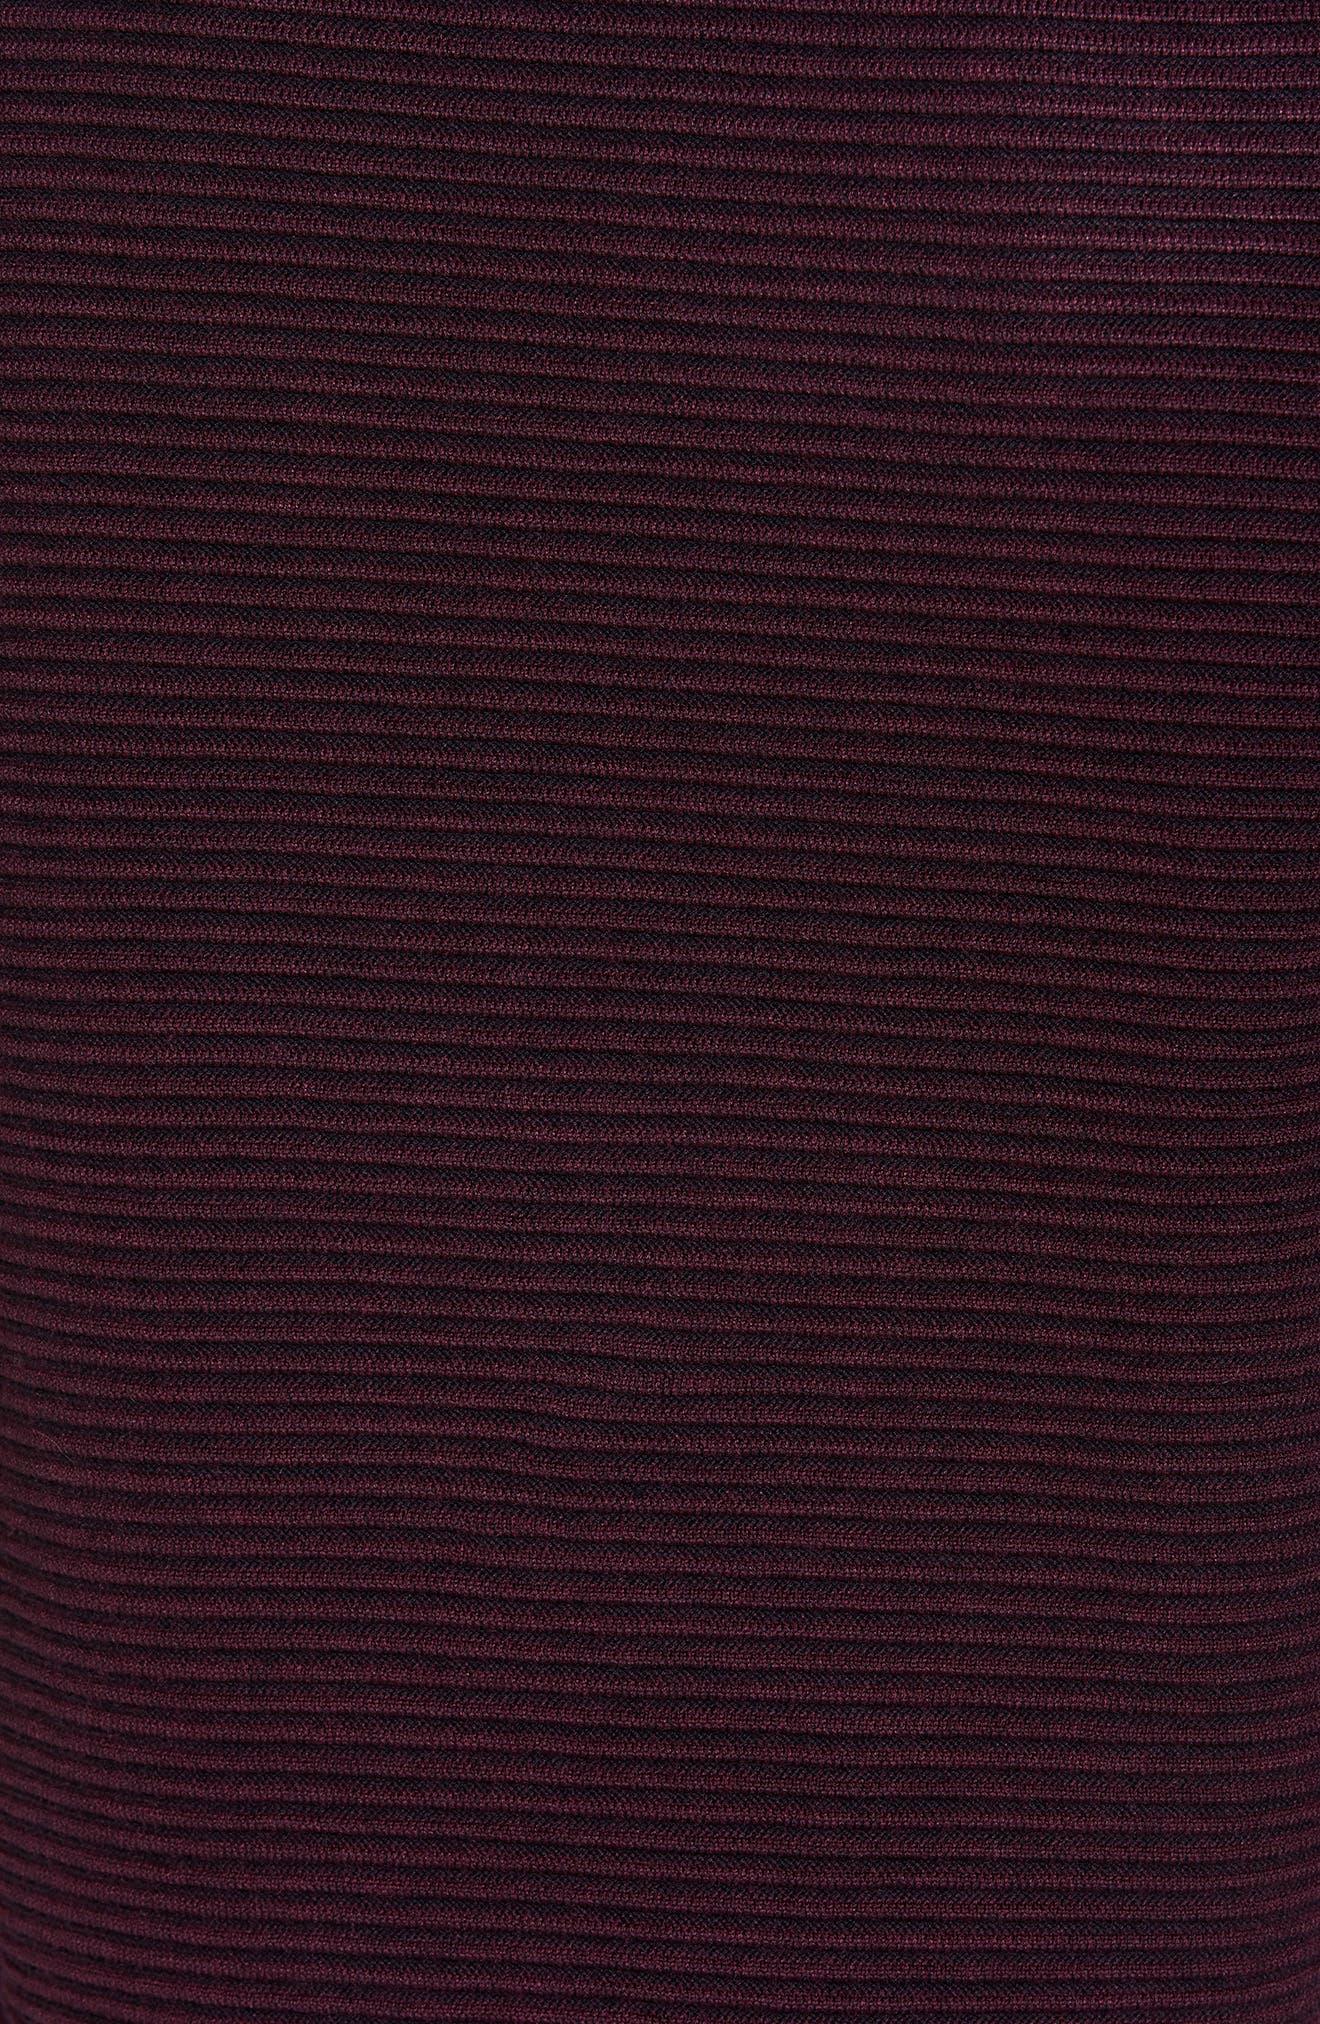 Cashoo Slim Fit Ribbed Sweatshirt,                             Alternate thumbnail 5, color,                             Purple